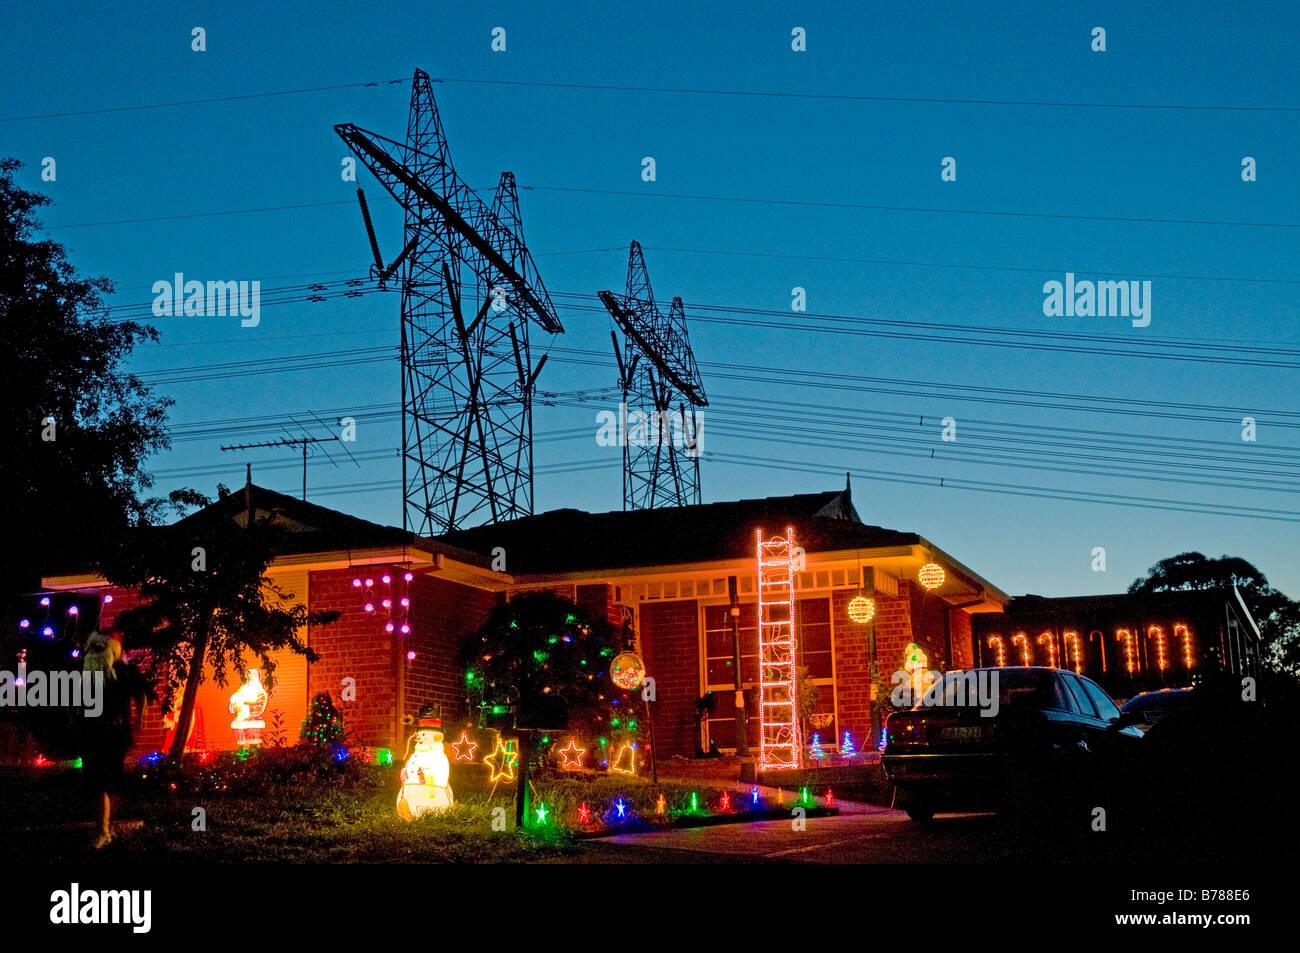 Christmas In Australia Background.Christmas Lights Festooning A Suburban Home In Australia